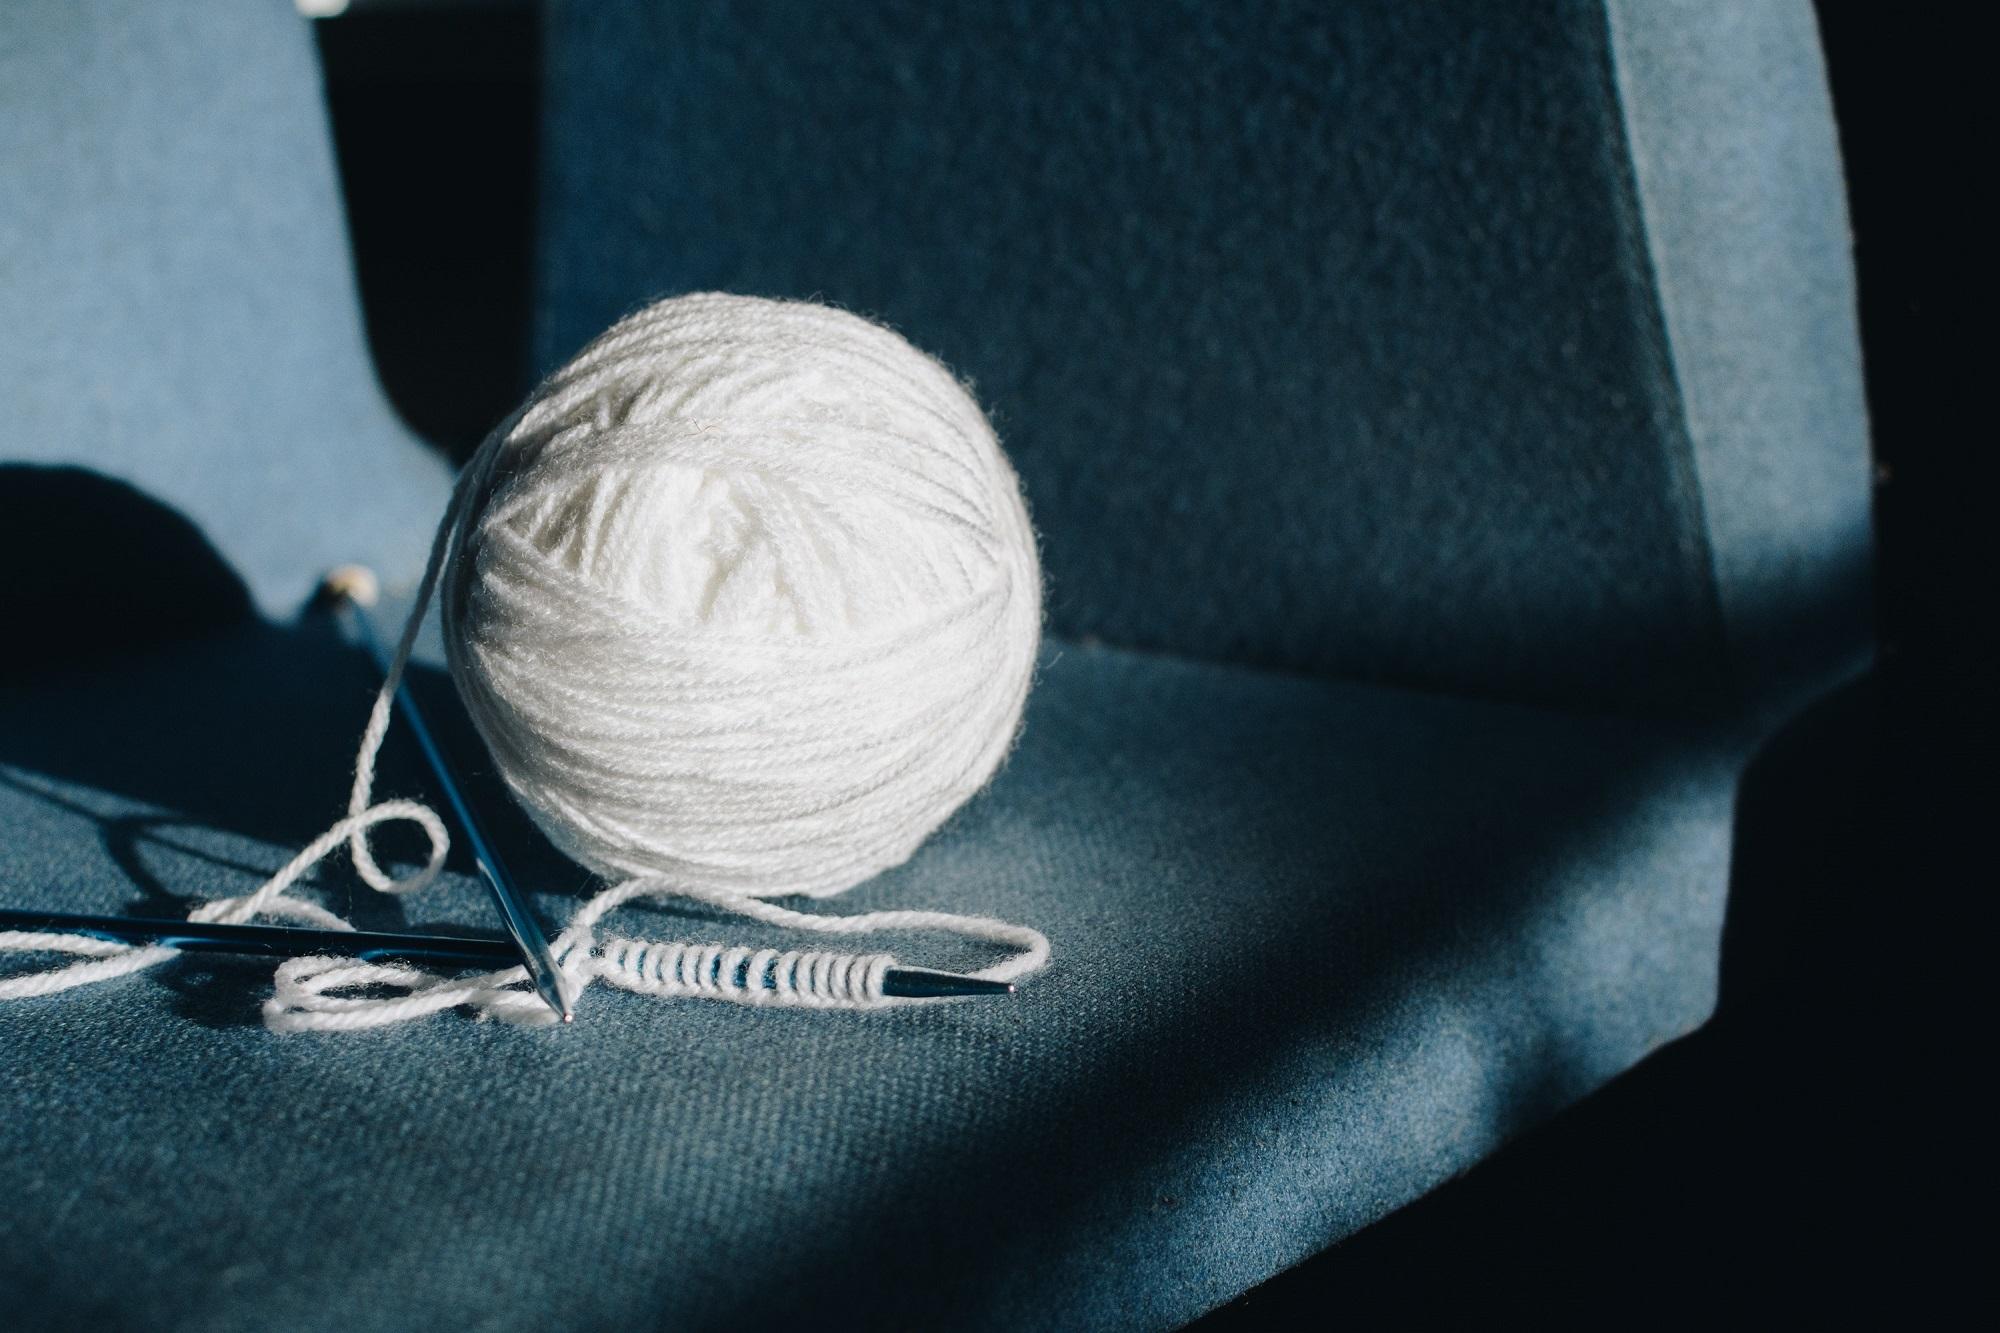 Knitting: Sock Knitting for Beginners - 2 Night : Susan Burns